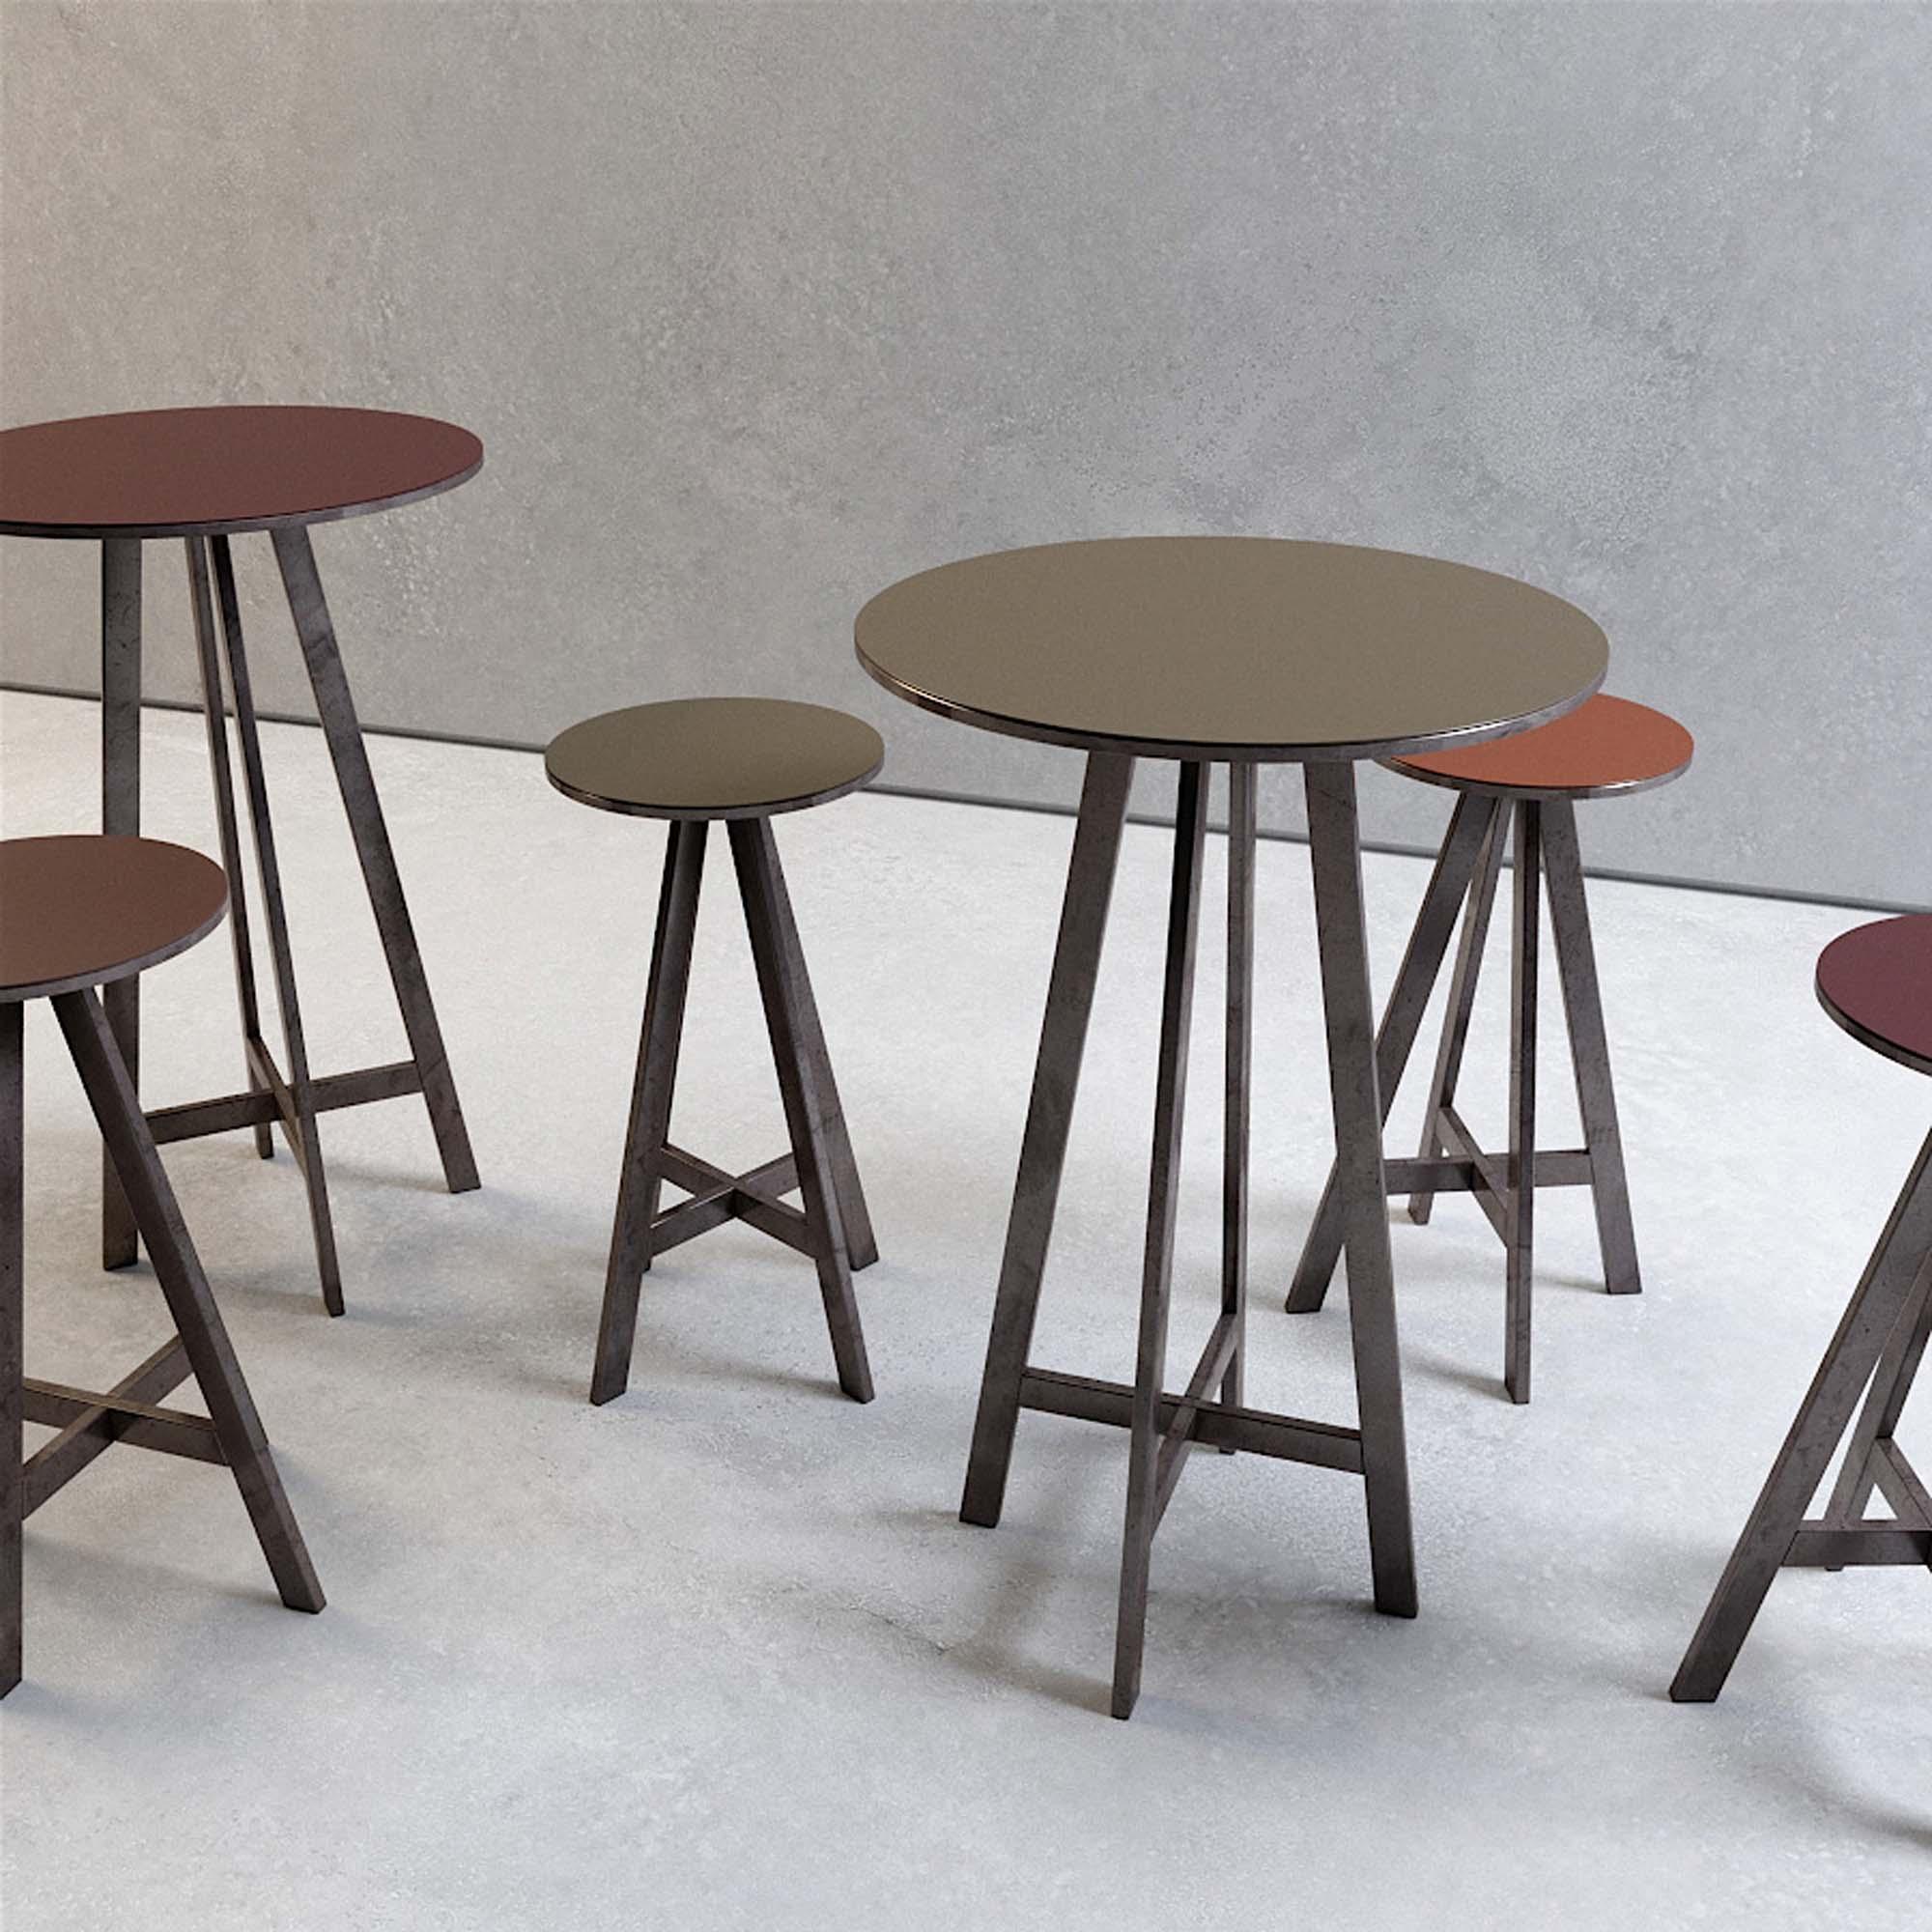 Table 3D Model 2